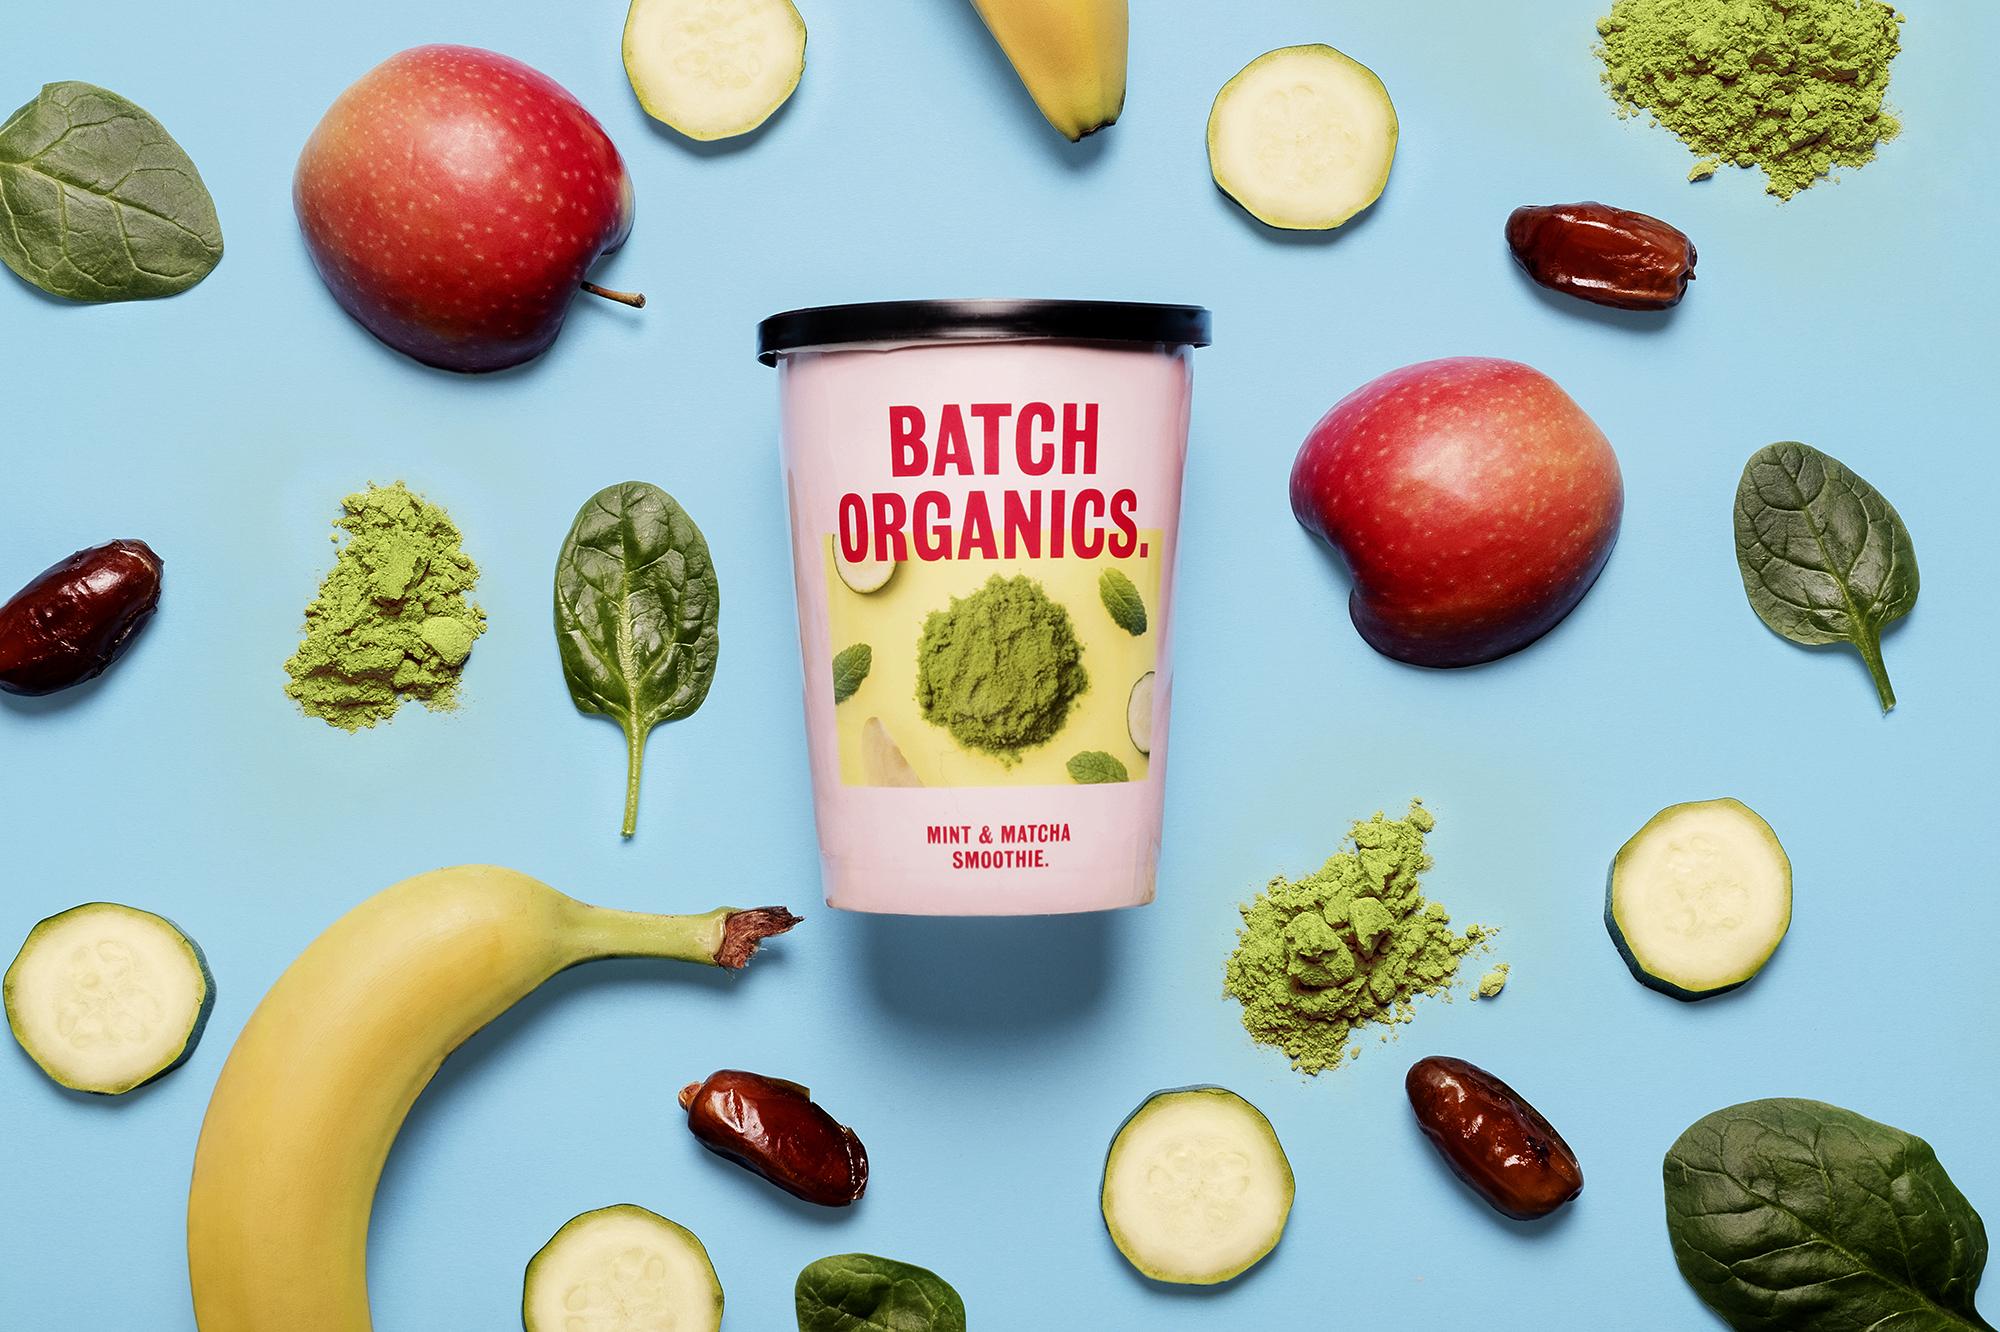 Batch_Organics_Still_Life_Food_Photographer_Photography_1.jpg